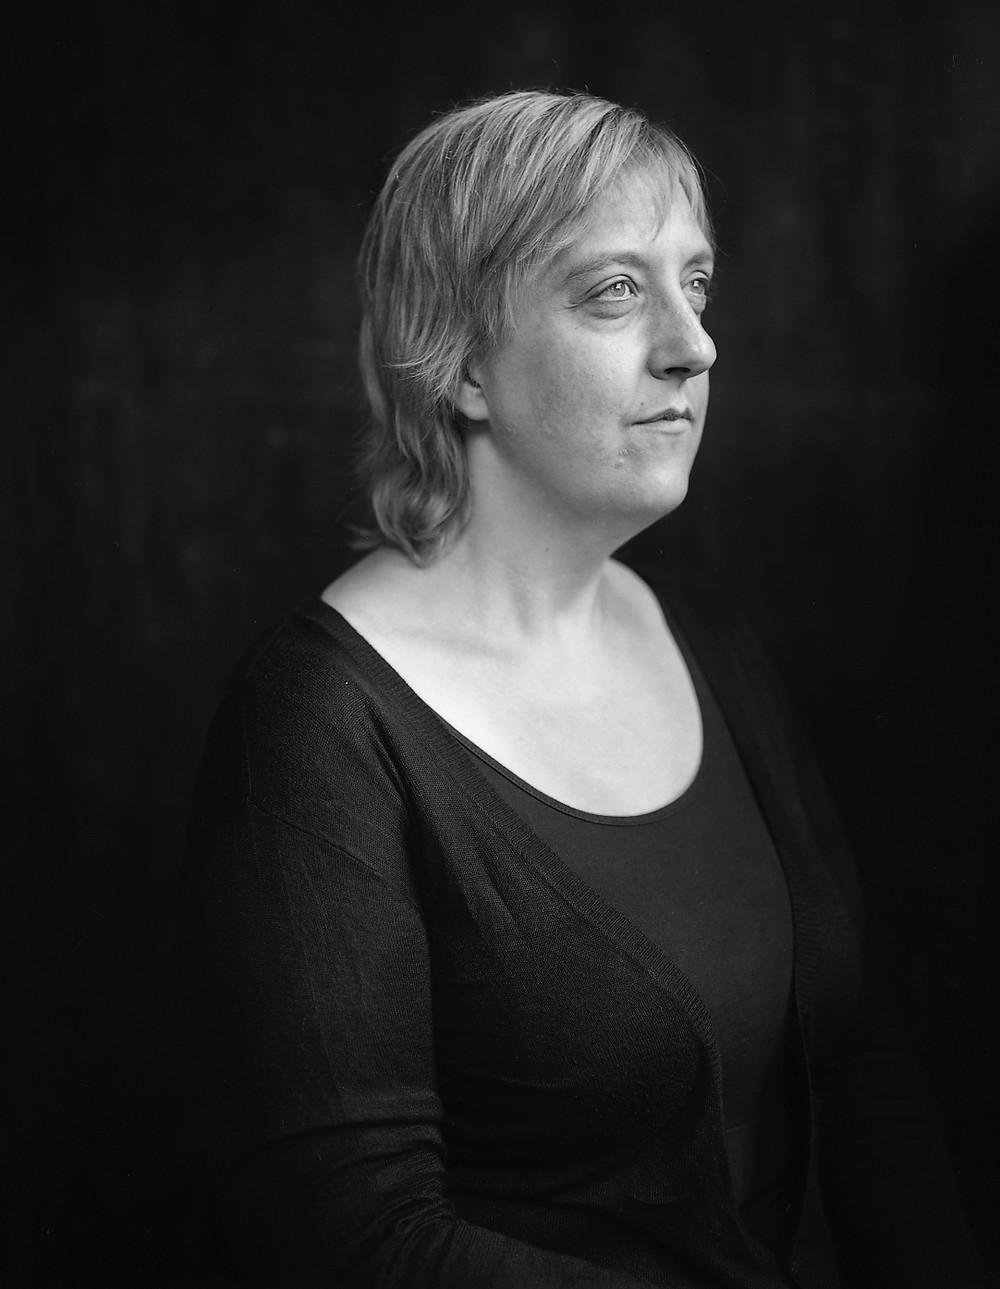 Portrait Isabelle006.JPG